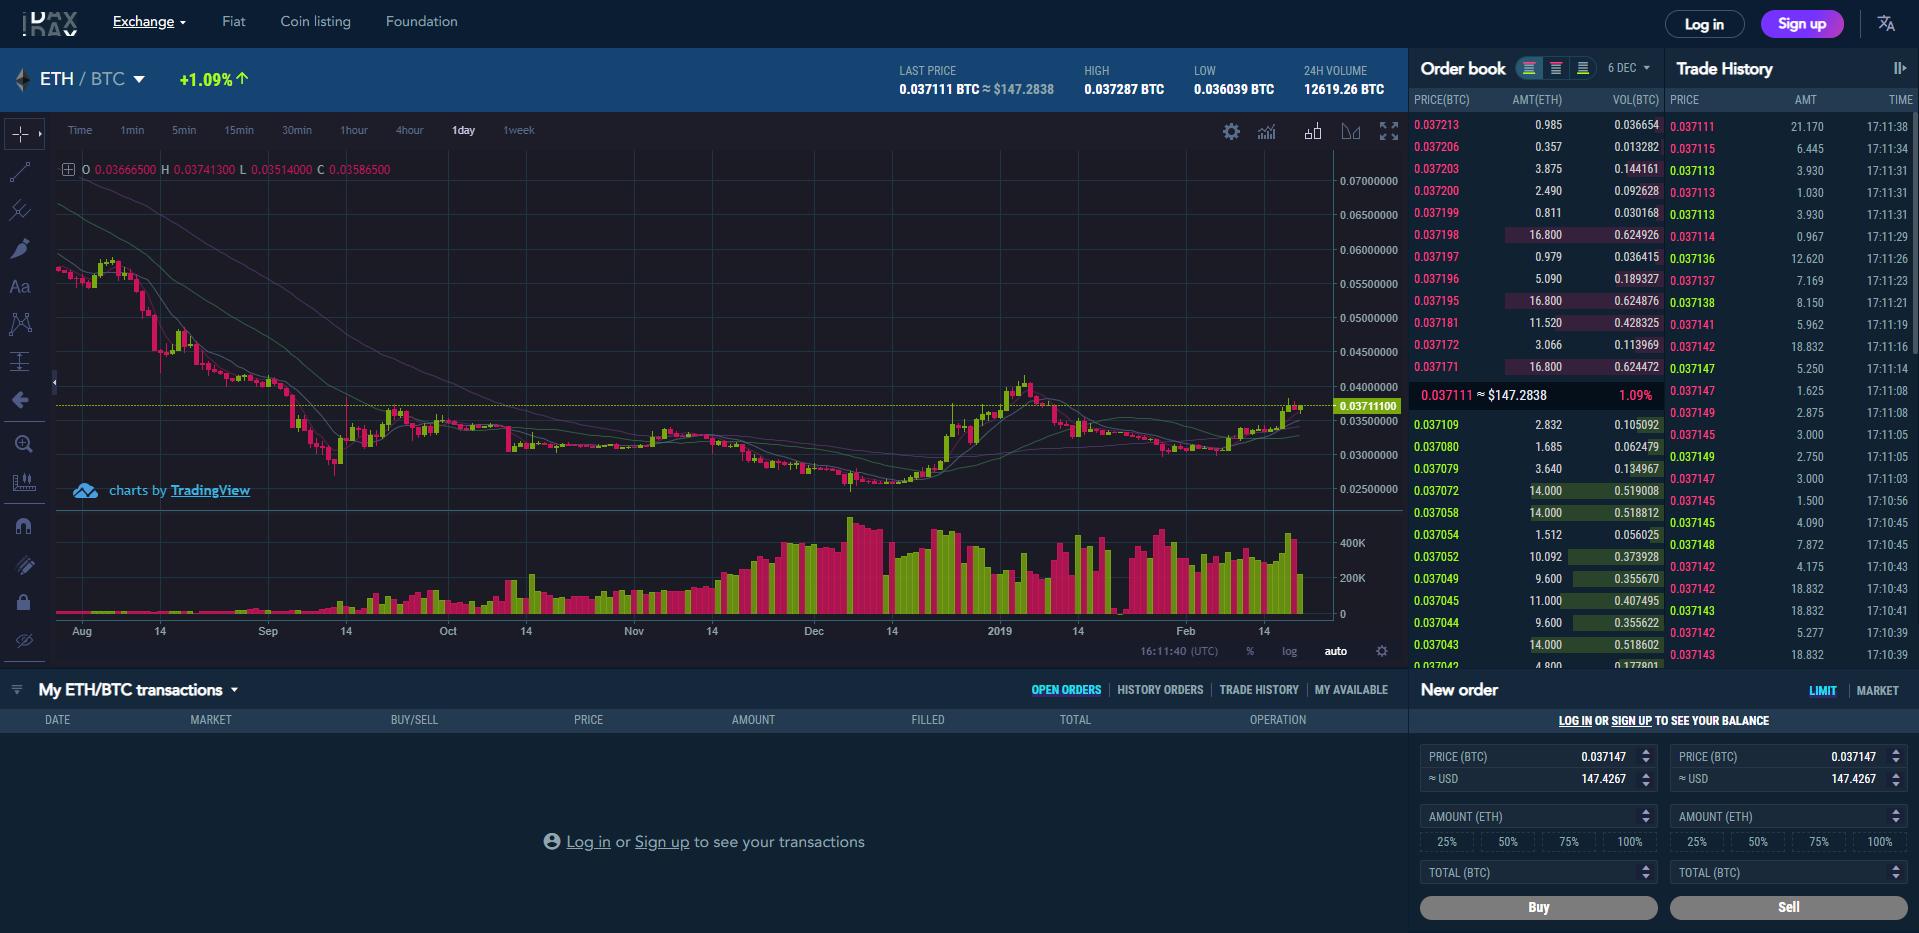 IDAX Trading View